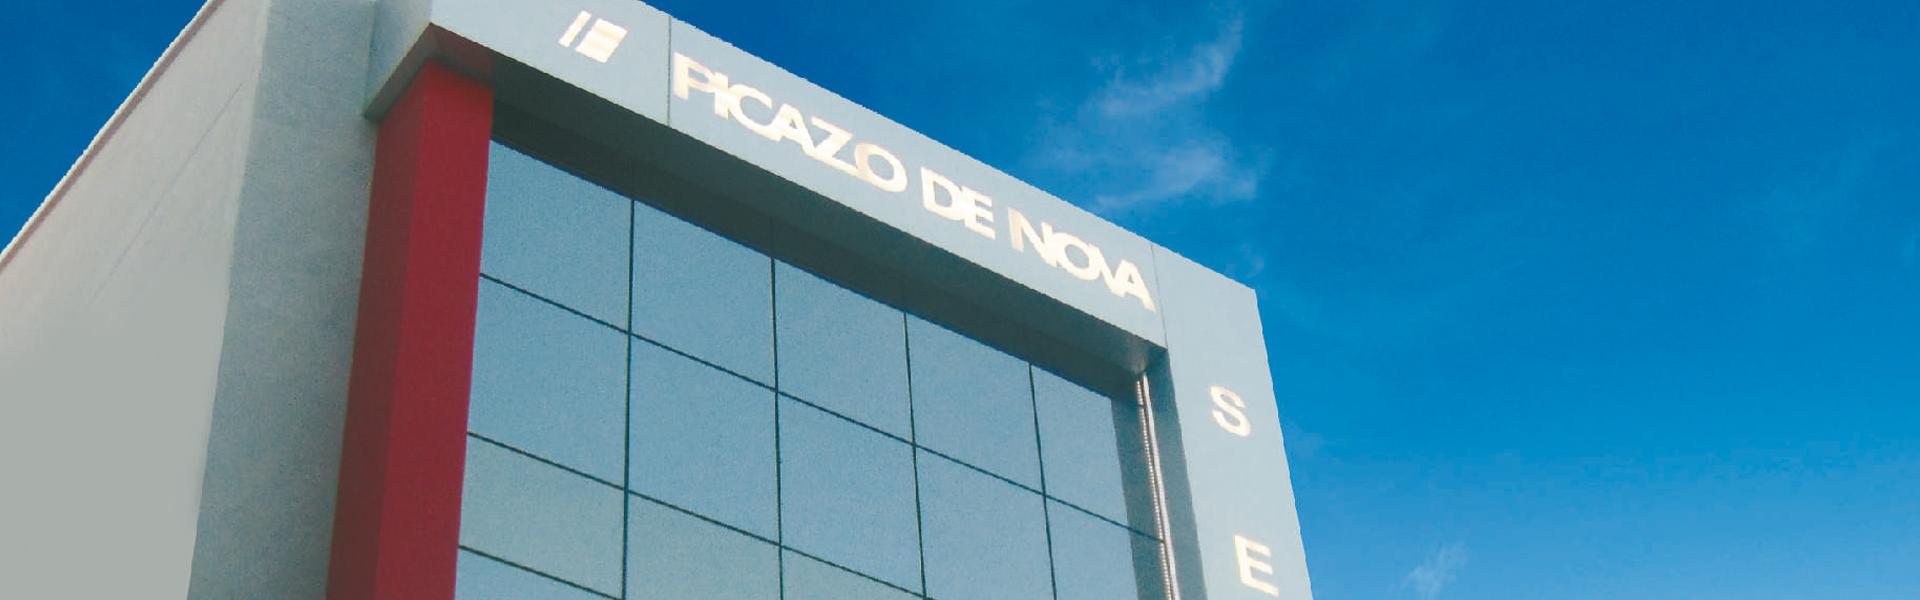 sede de la correduria de seguros Picazo de Nova